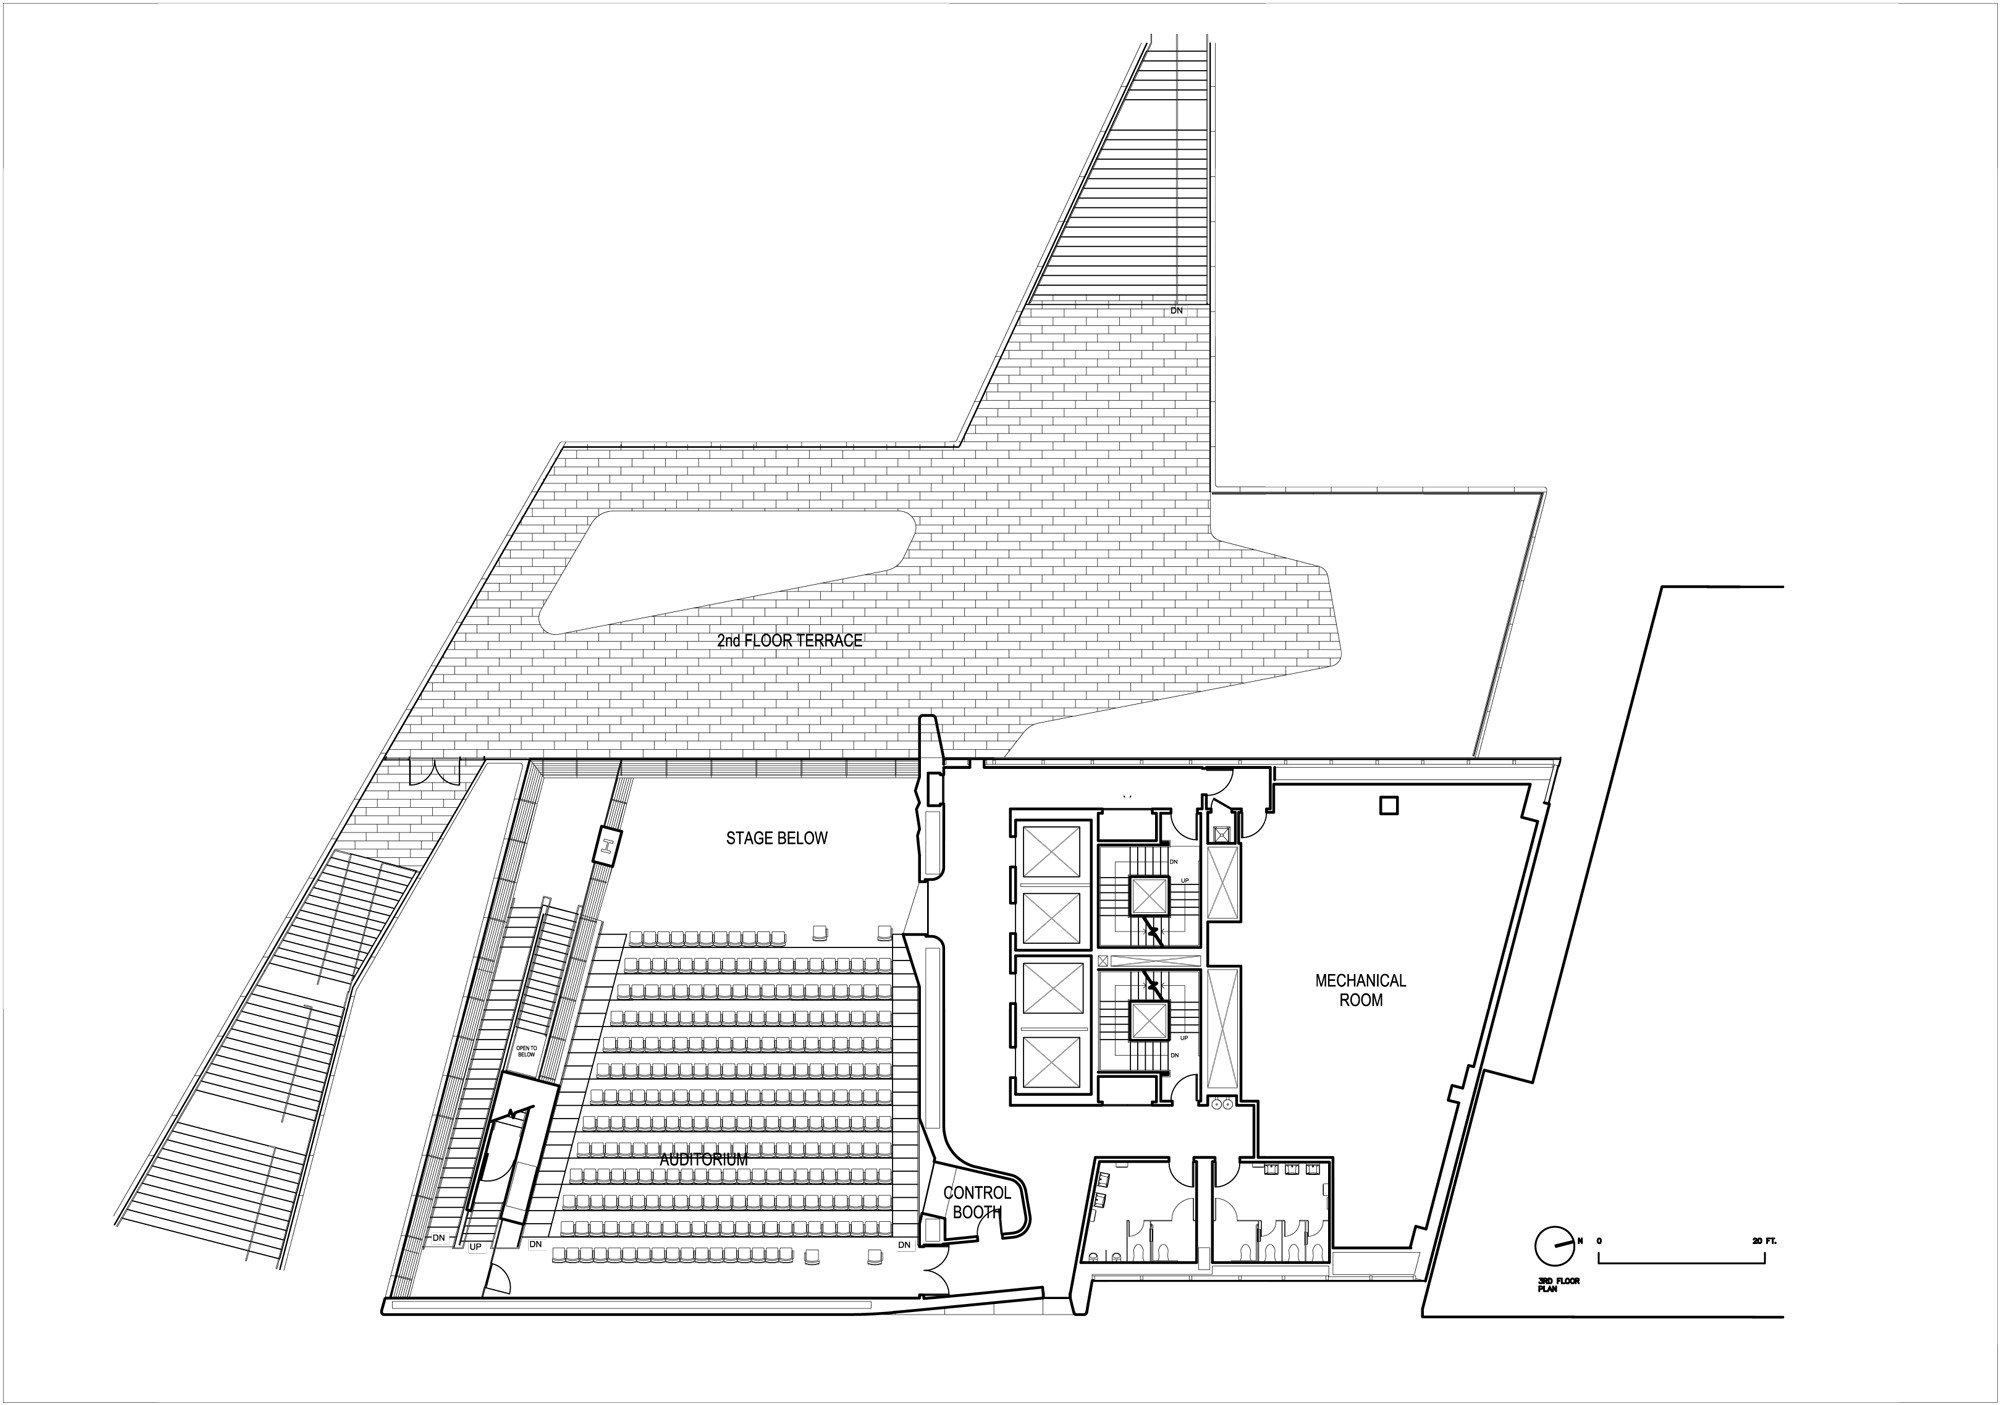 roy and diana vagelos education center in new york glas bildung baunetz wissen. Black Bedroom Furniture Sets. Home Design Ideas